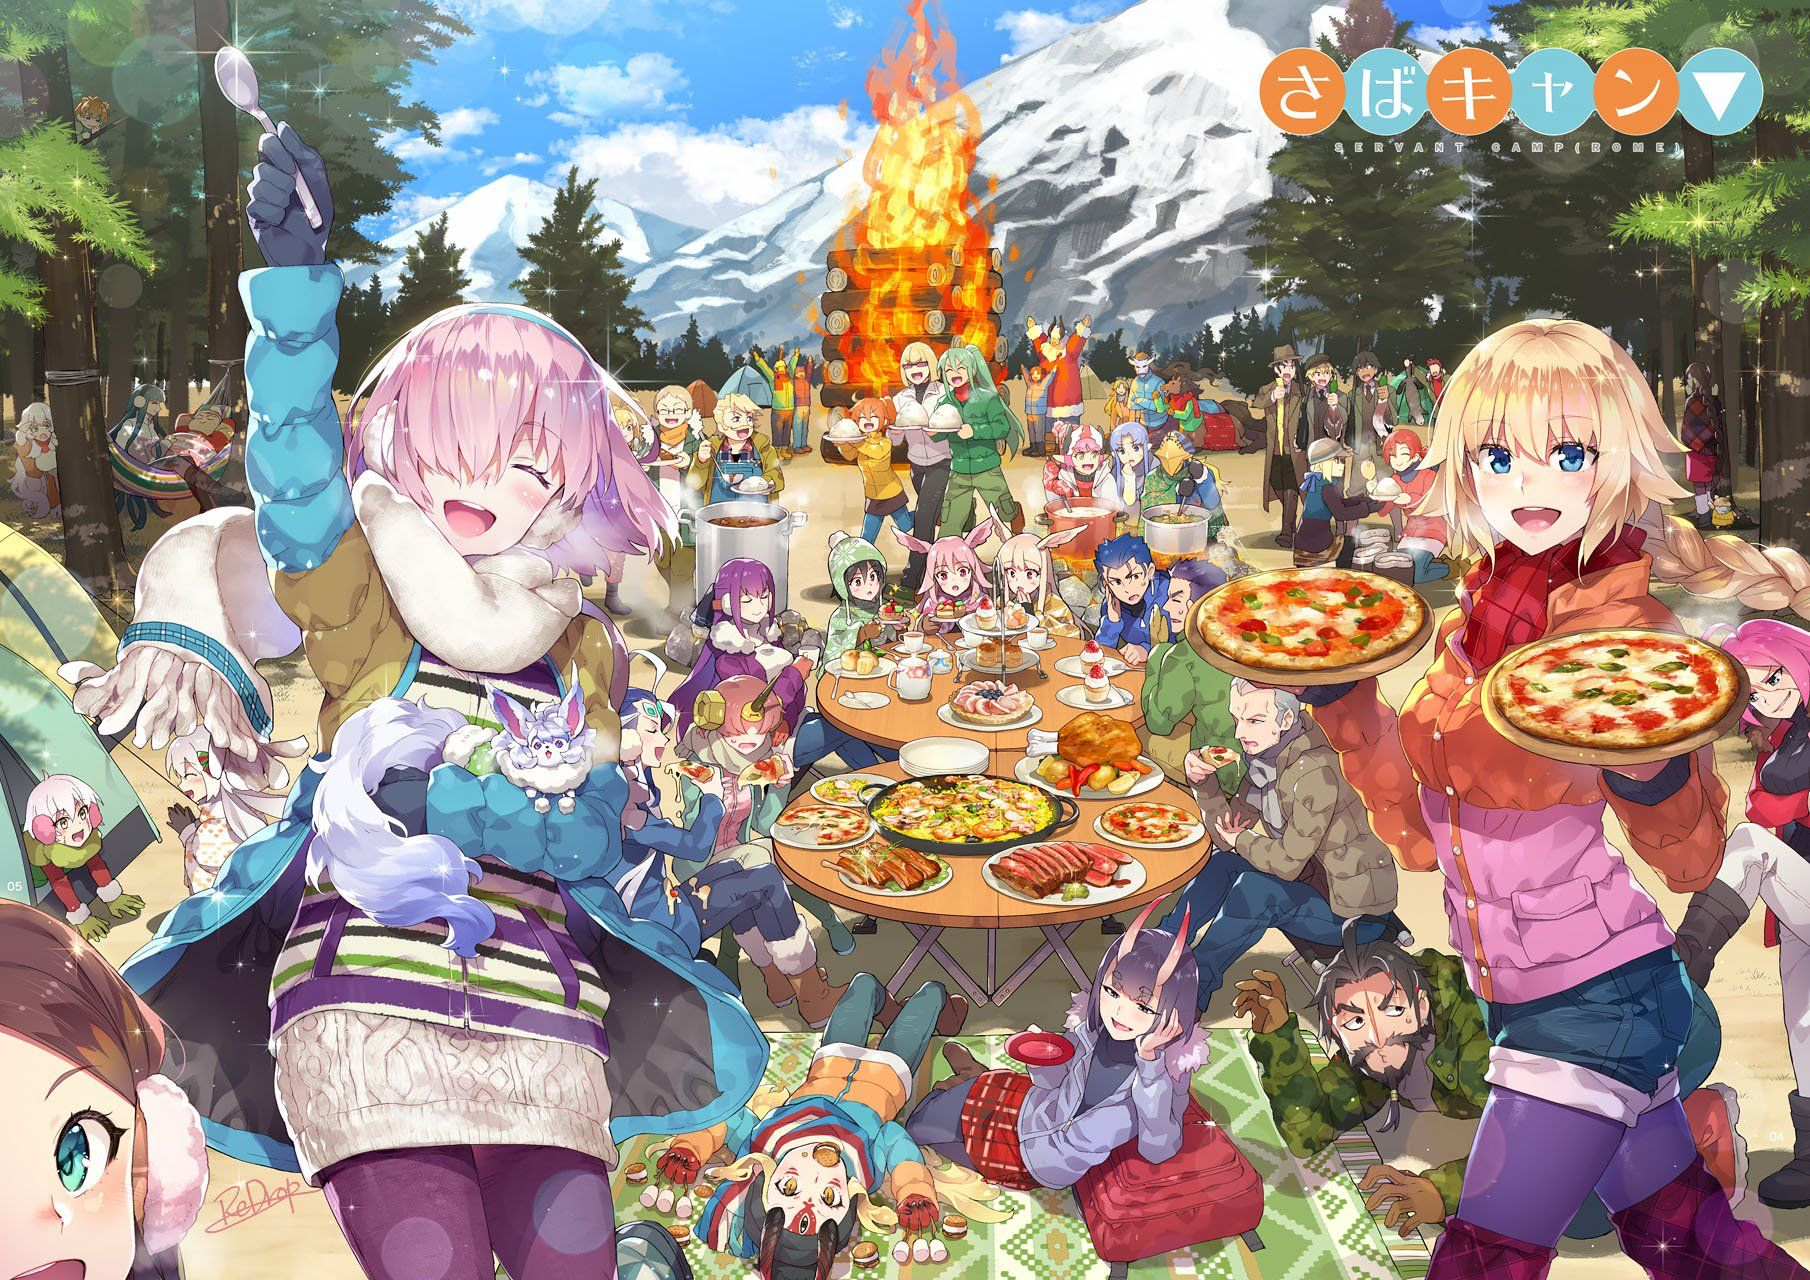 Pin By John Kam On Fate In 2020 Anime Anime Art Fate